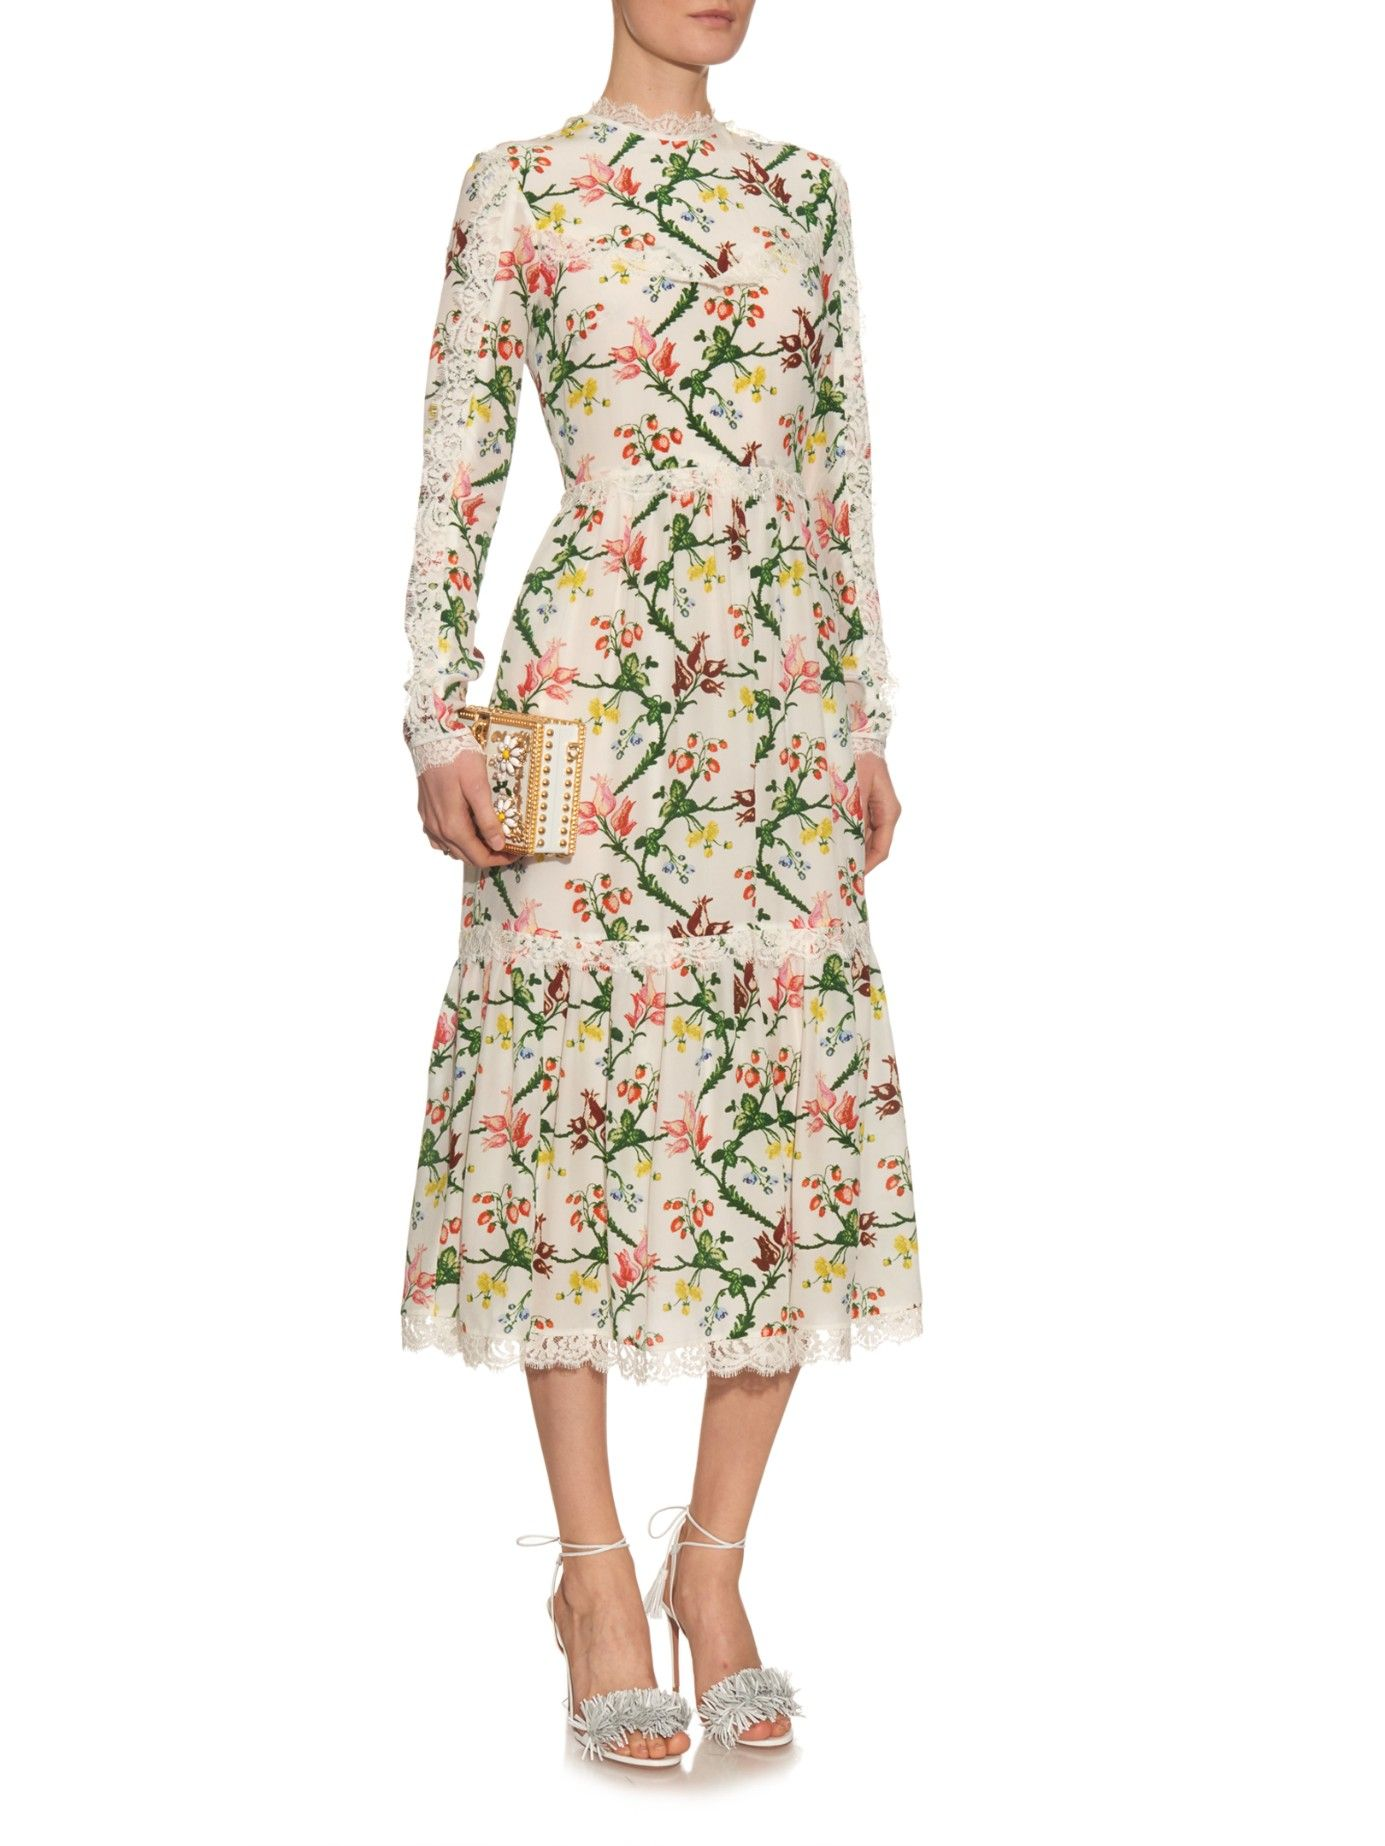 Erdem silk and lace dress